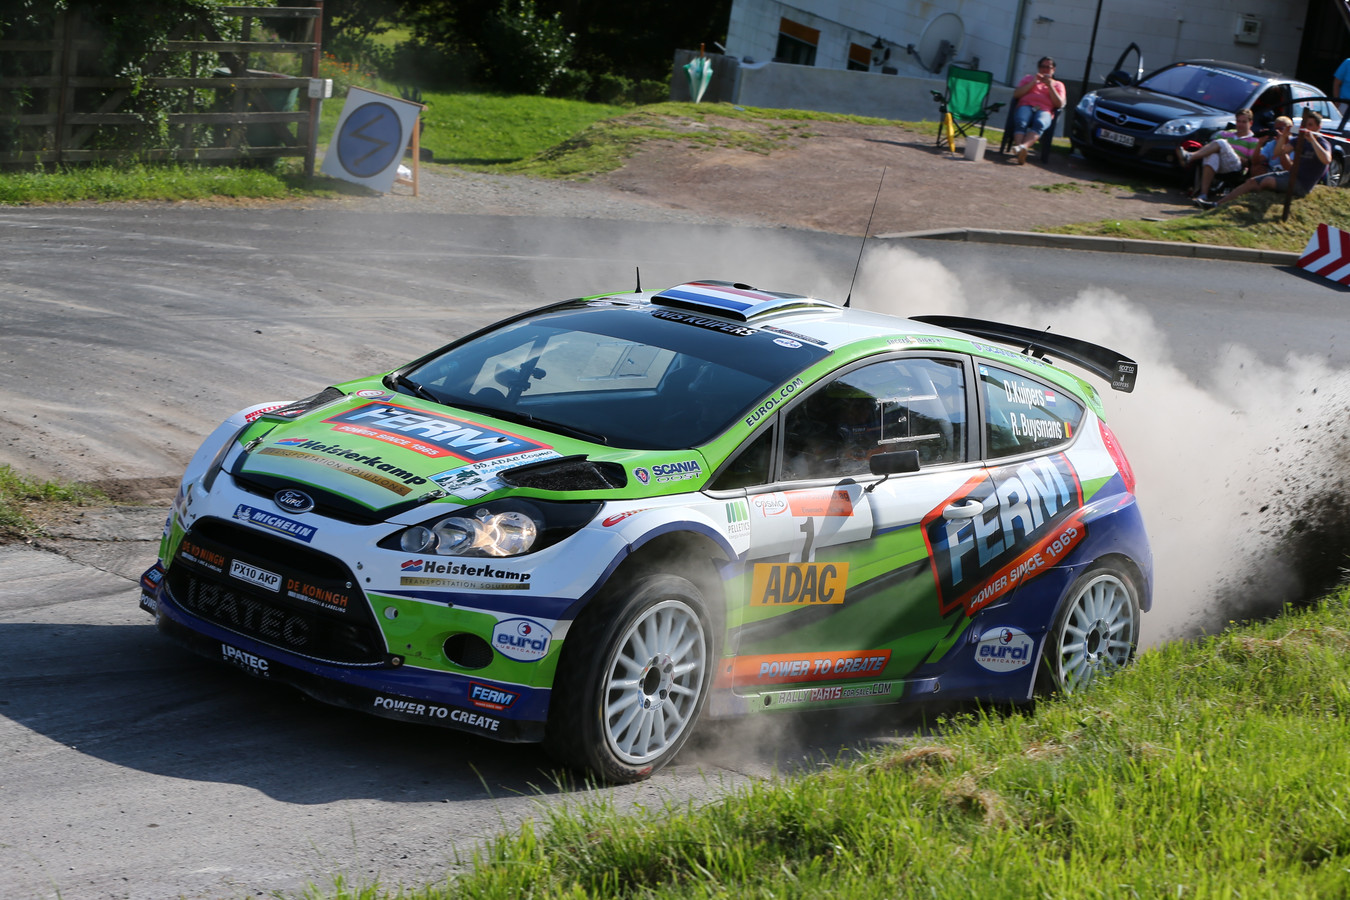 Kuipers Gaat Voor Top 10 Plek In Wk Rally Duitsland Foto Tubantia Nl